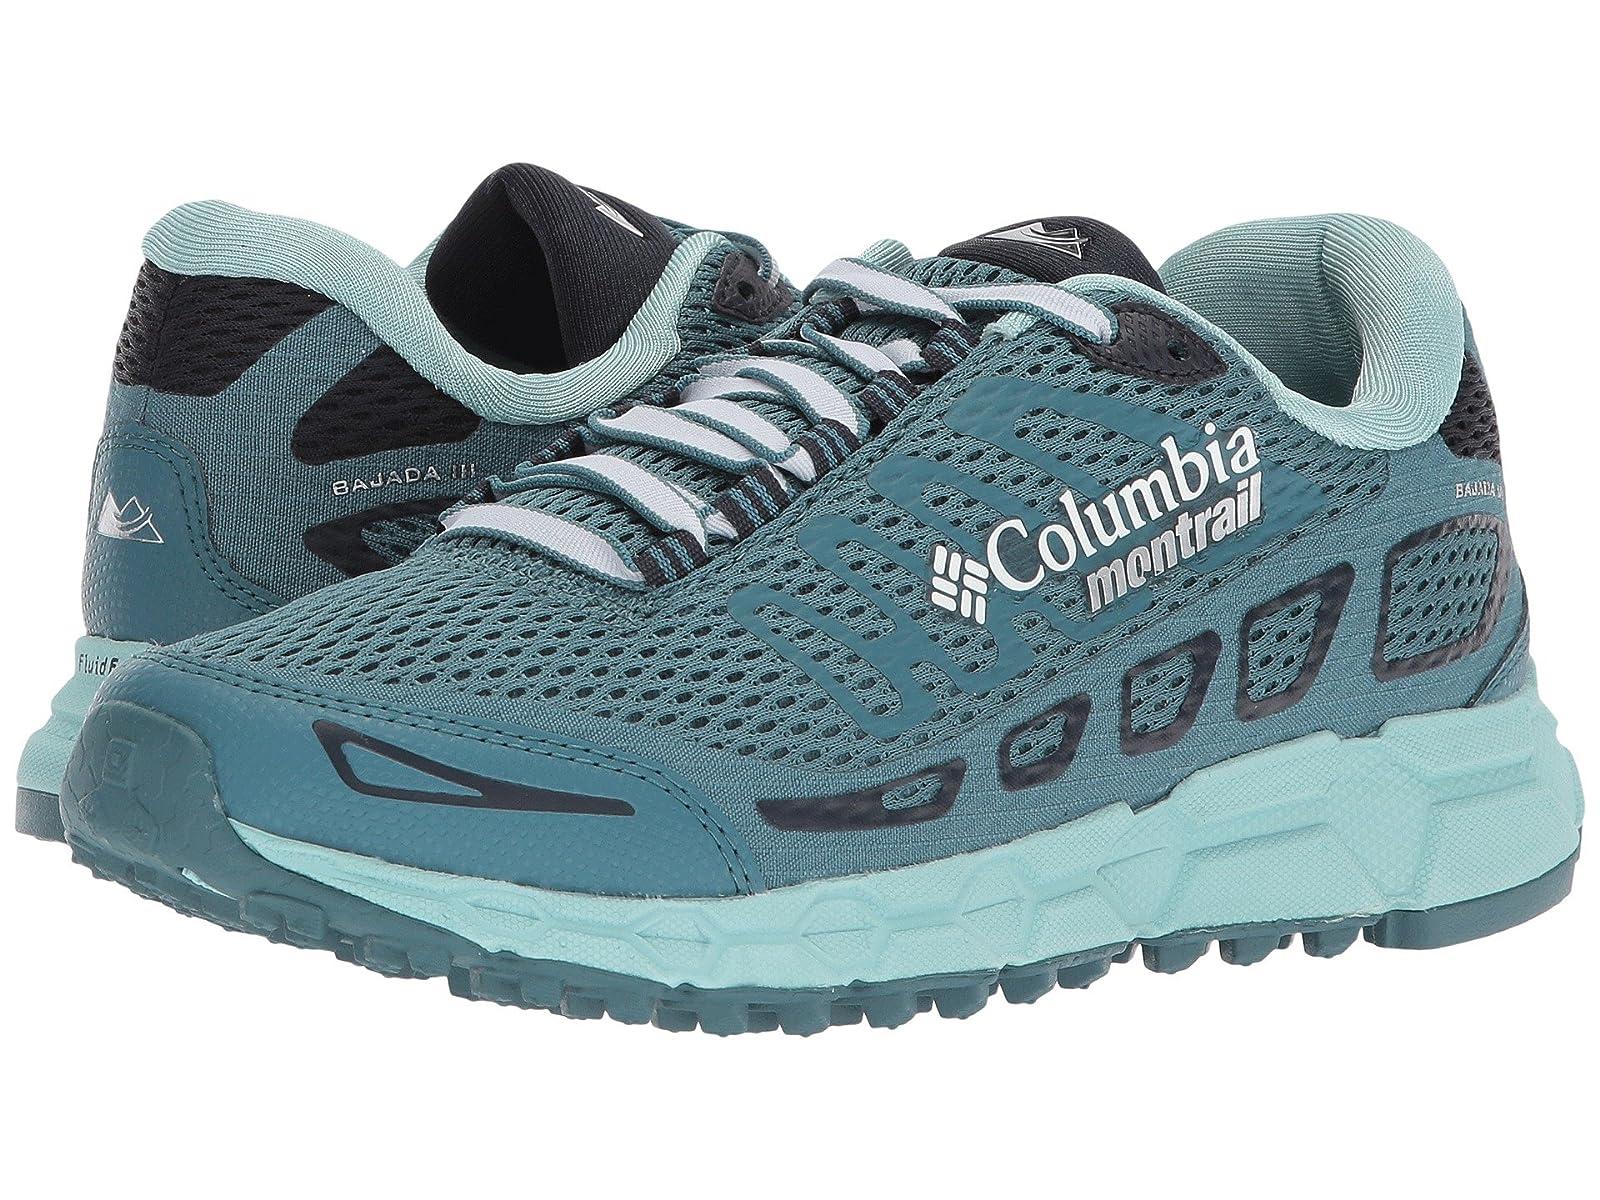 Columbia Bajada™ IIICheap and distinctive eye-catching shoes